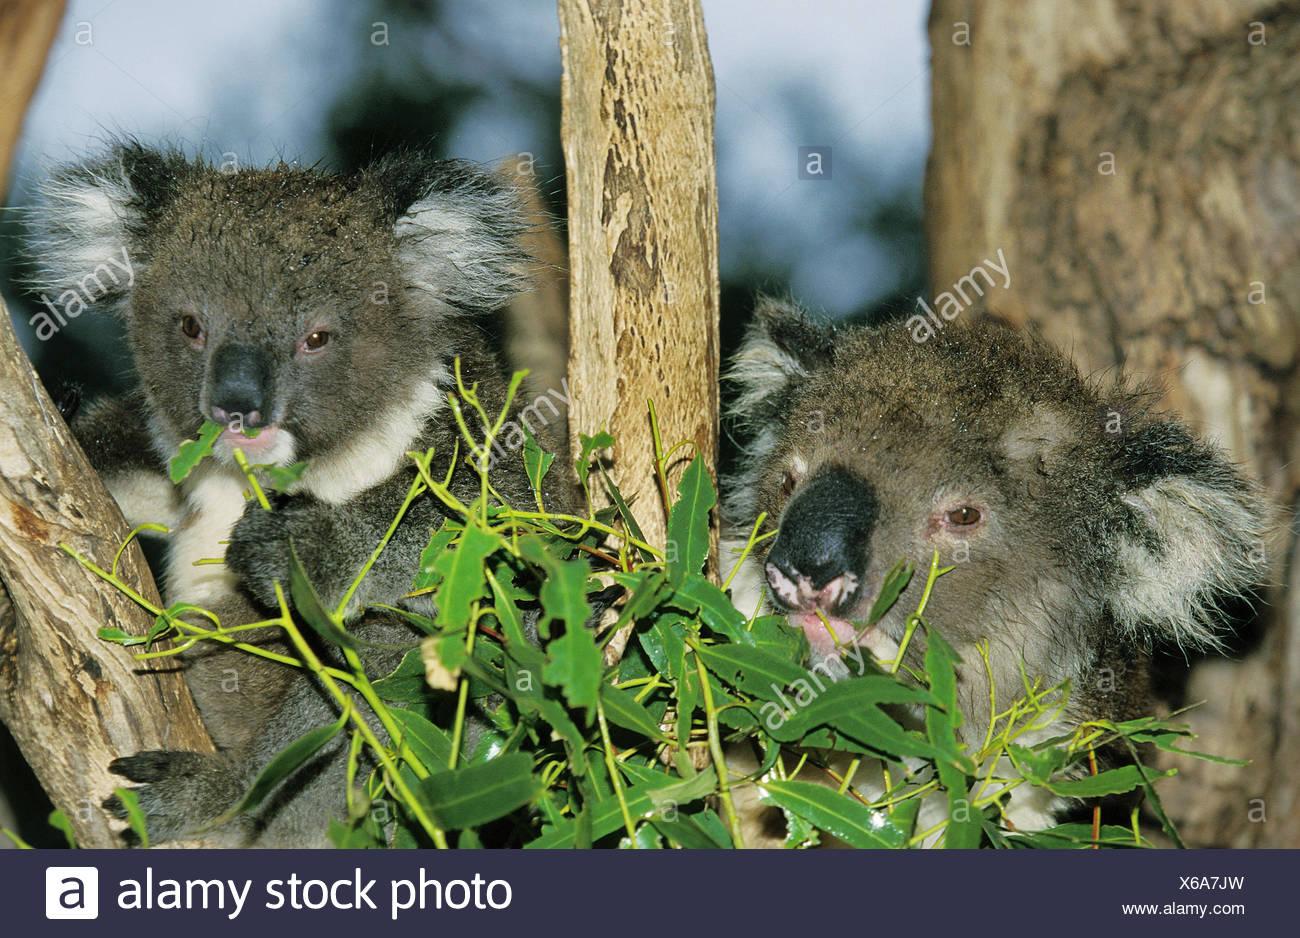 Koala or ash-grey koala,Phascolarctos cinereus,mother animal,young animal,eat,eucalyptus,Australia, Stock Photo